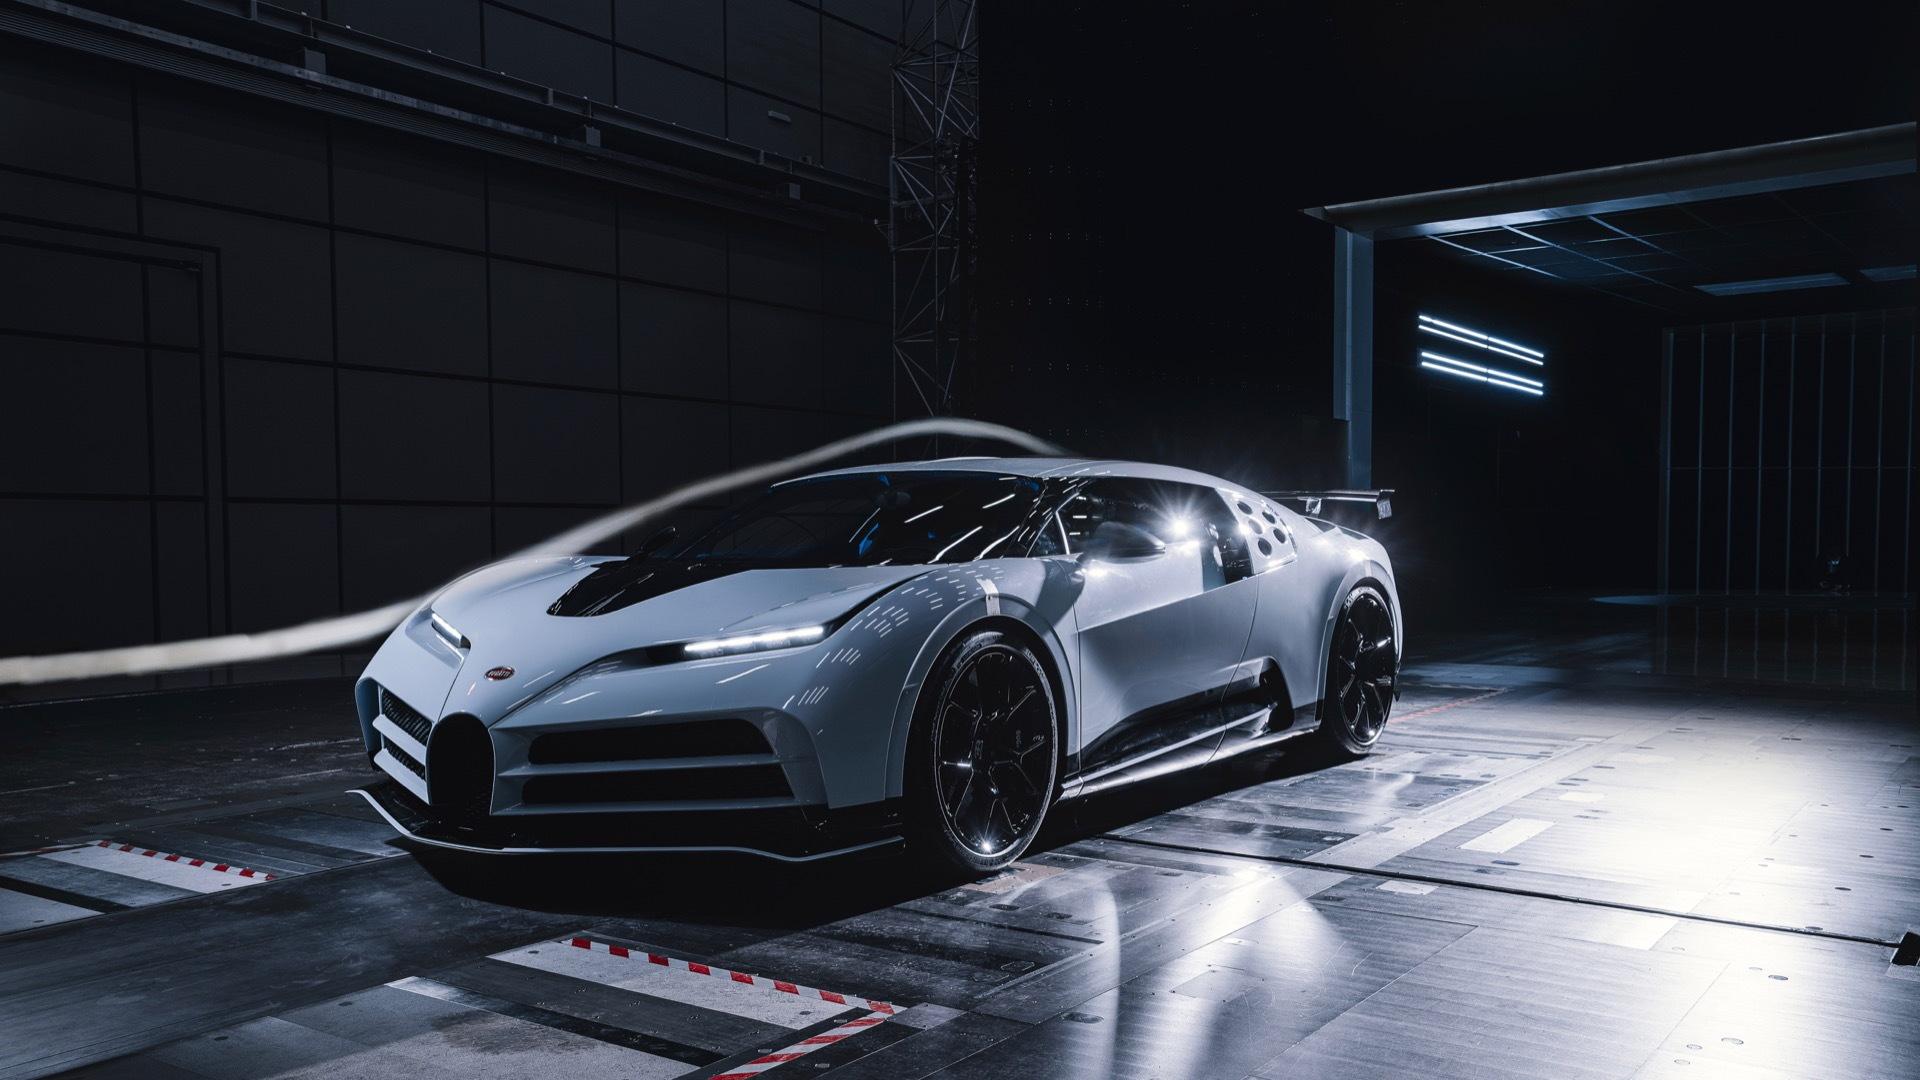 Bugatti Centodieci wind tunnel testing